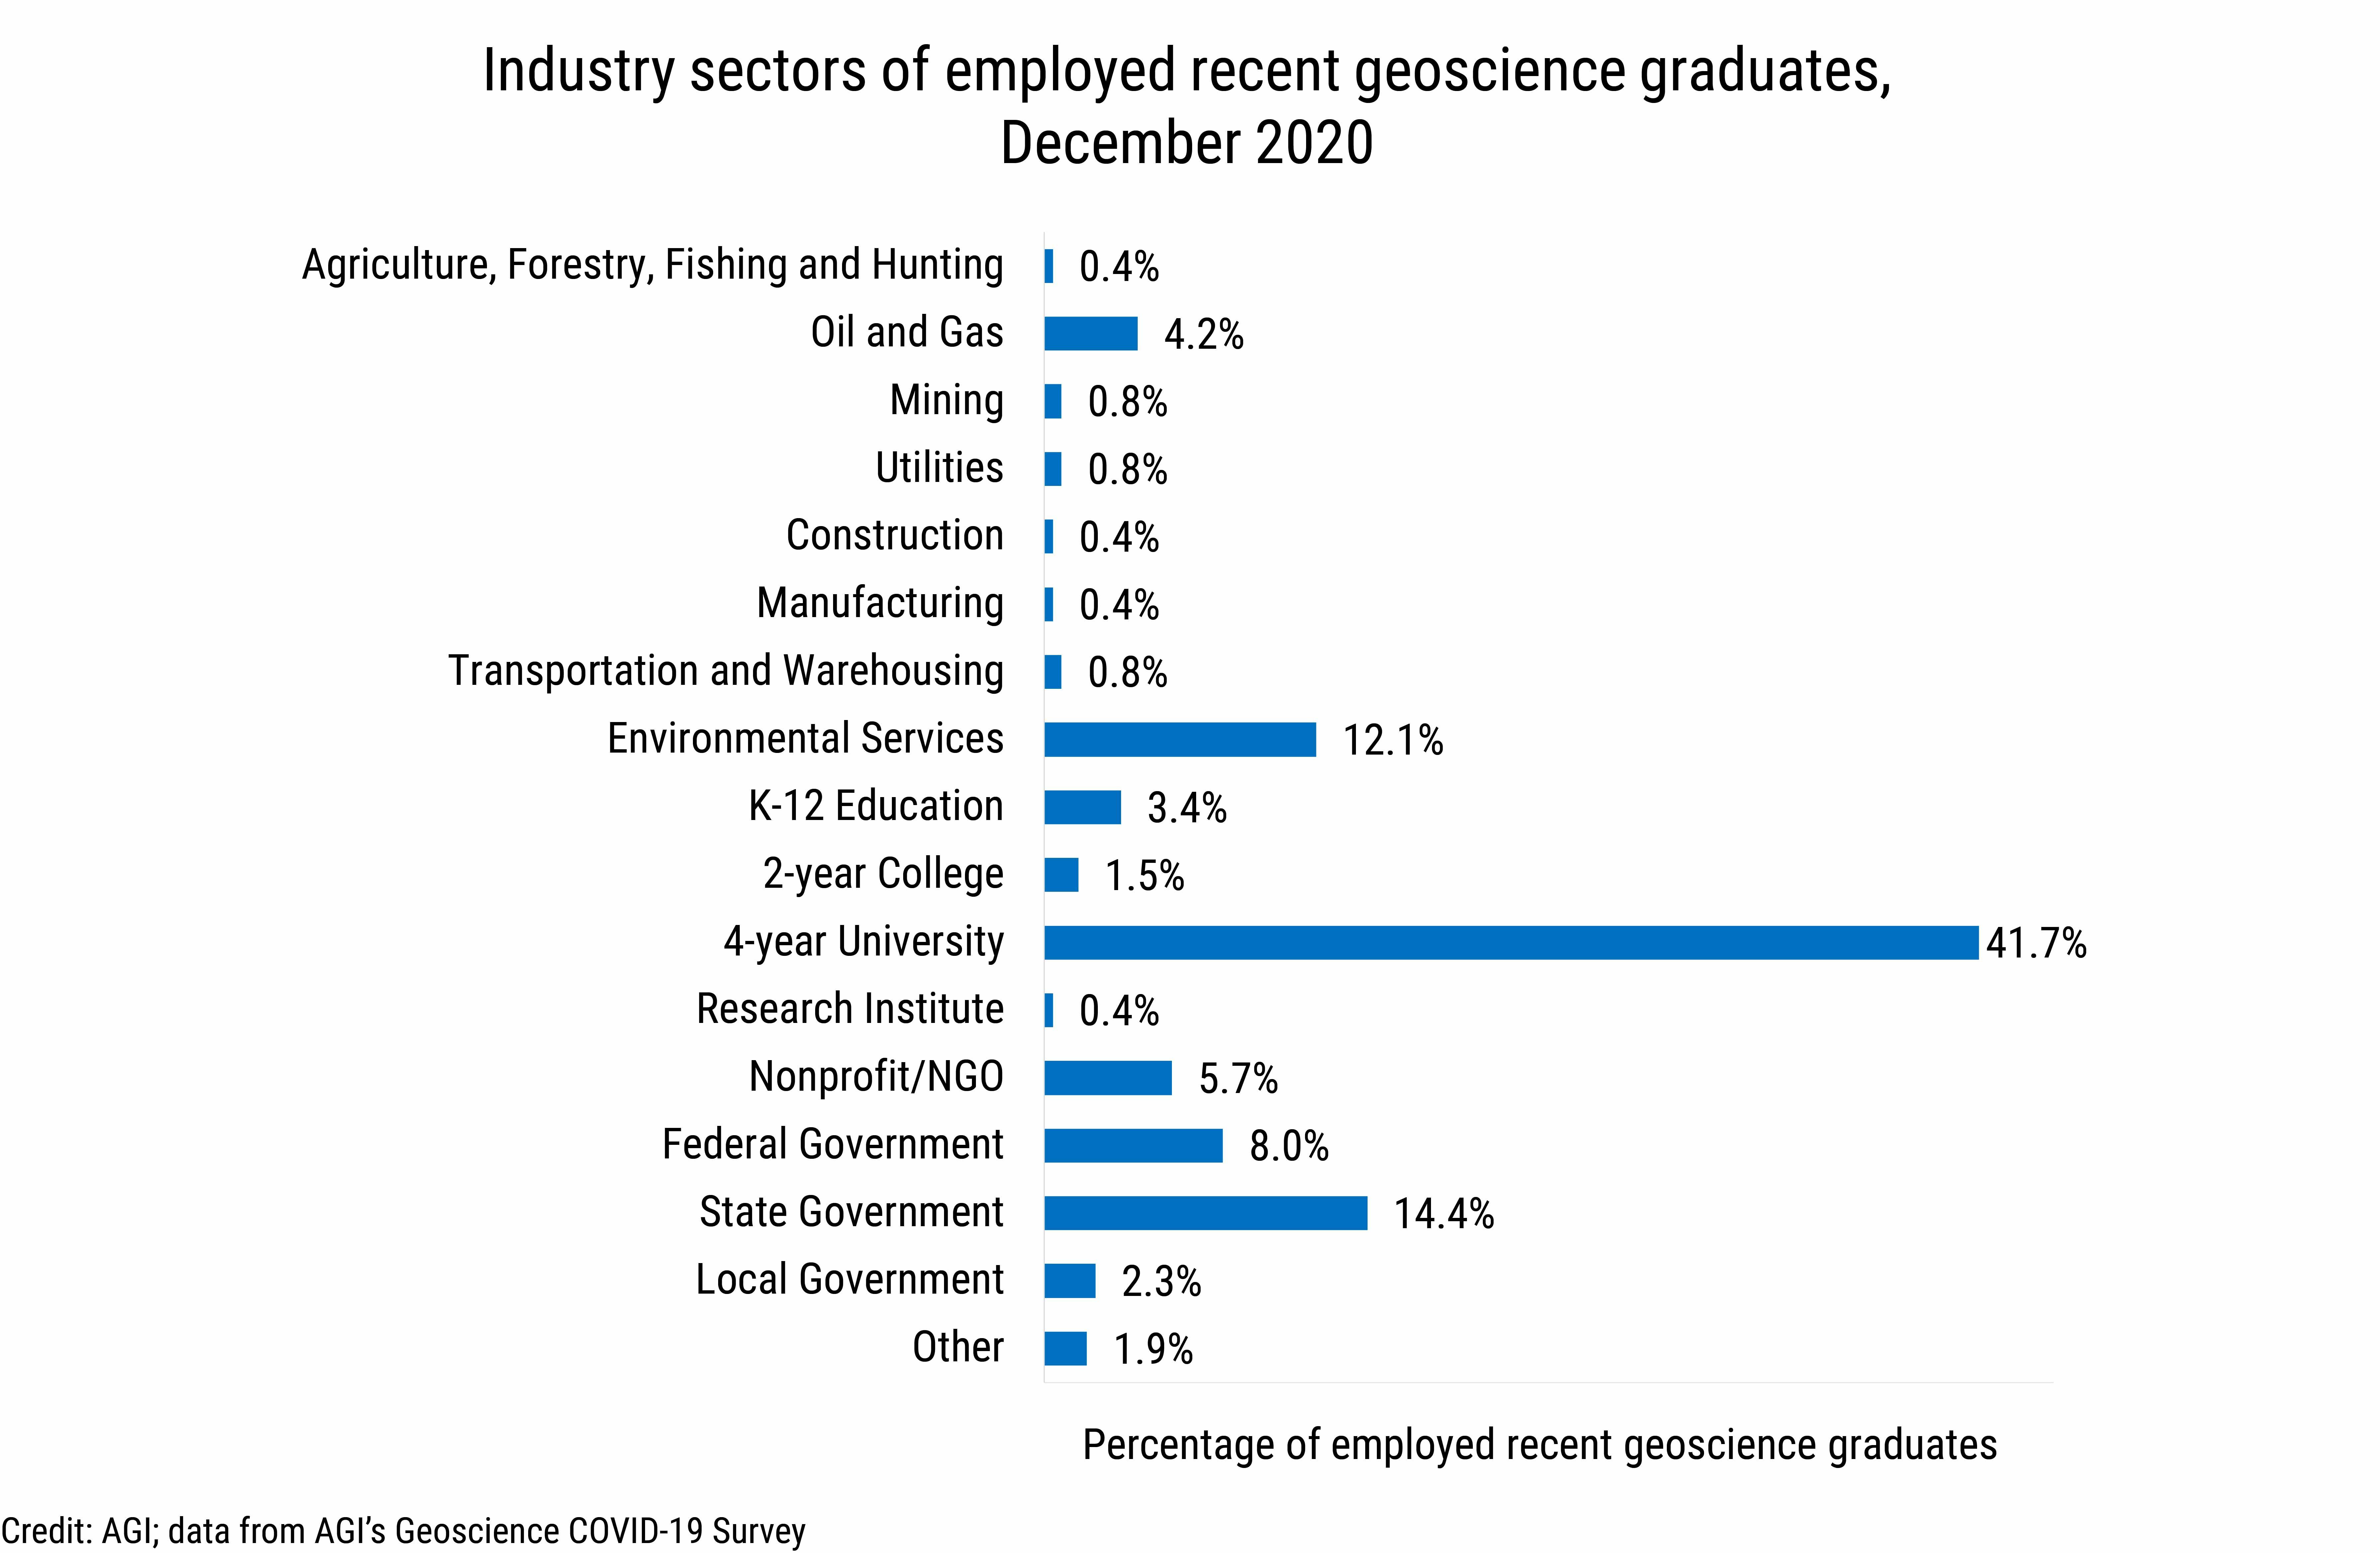 DB_2021-003_chart10: Industry sectors of employed recent geoscience graduates, December 2020 (Credit: AGI; data from AGI's Geoscience COVID-19 Survey)